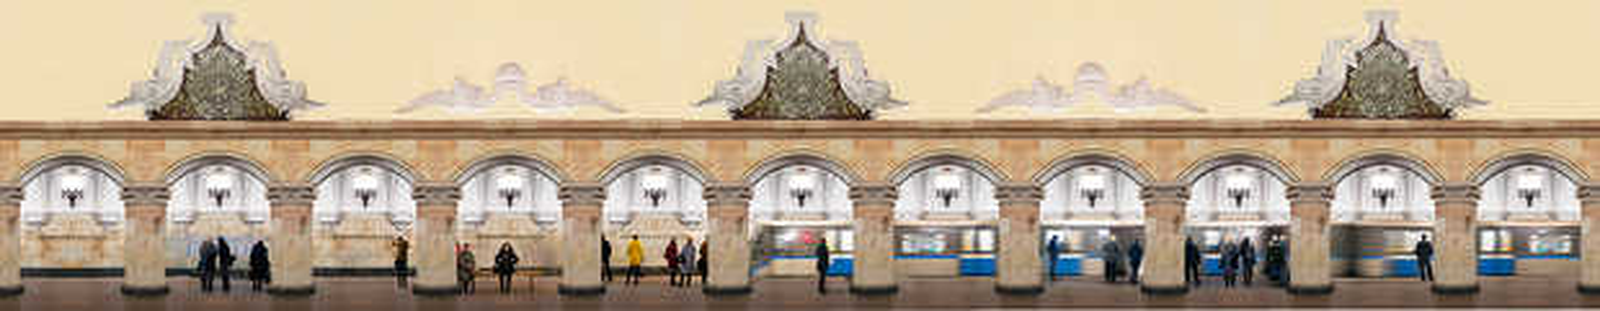 Moscow, Komsomolskaya, Circle Line - Larry Yust